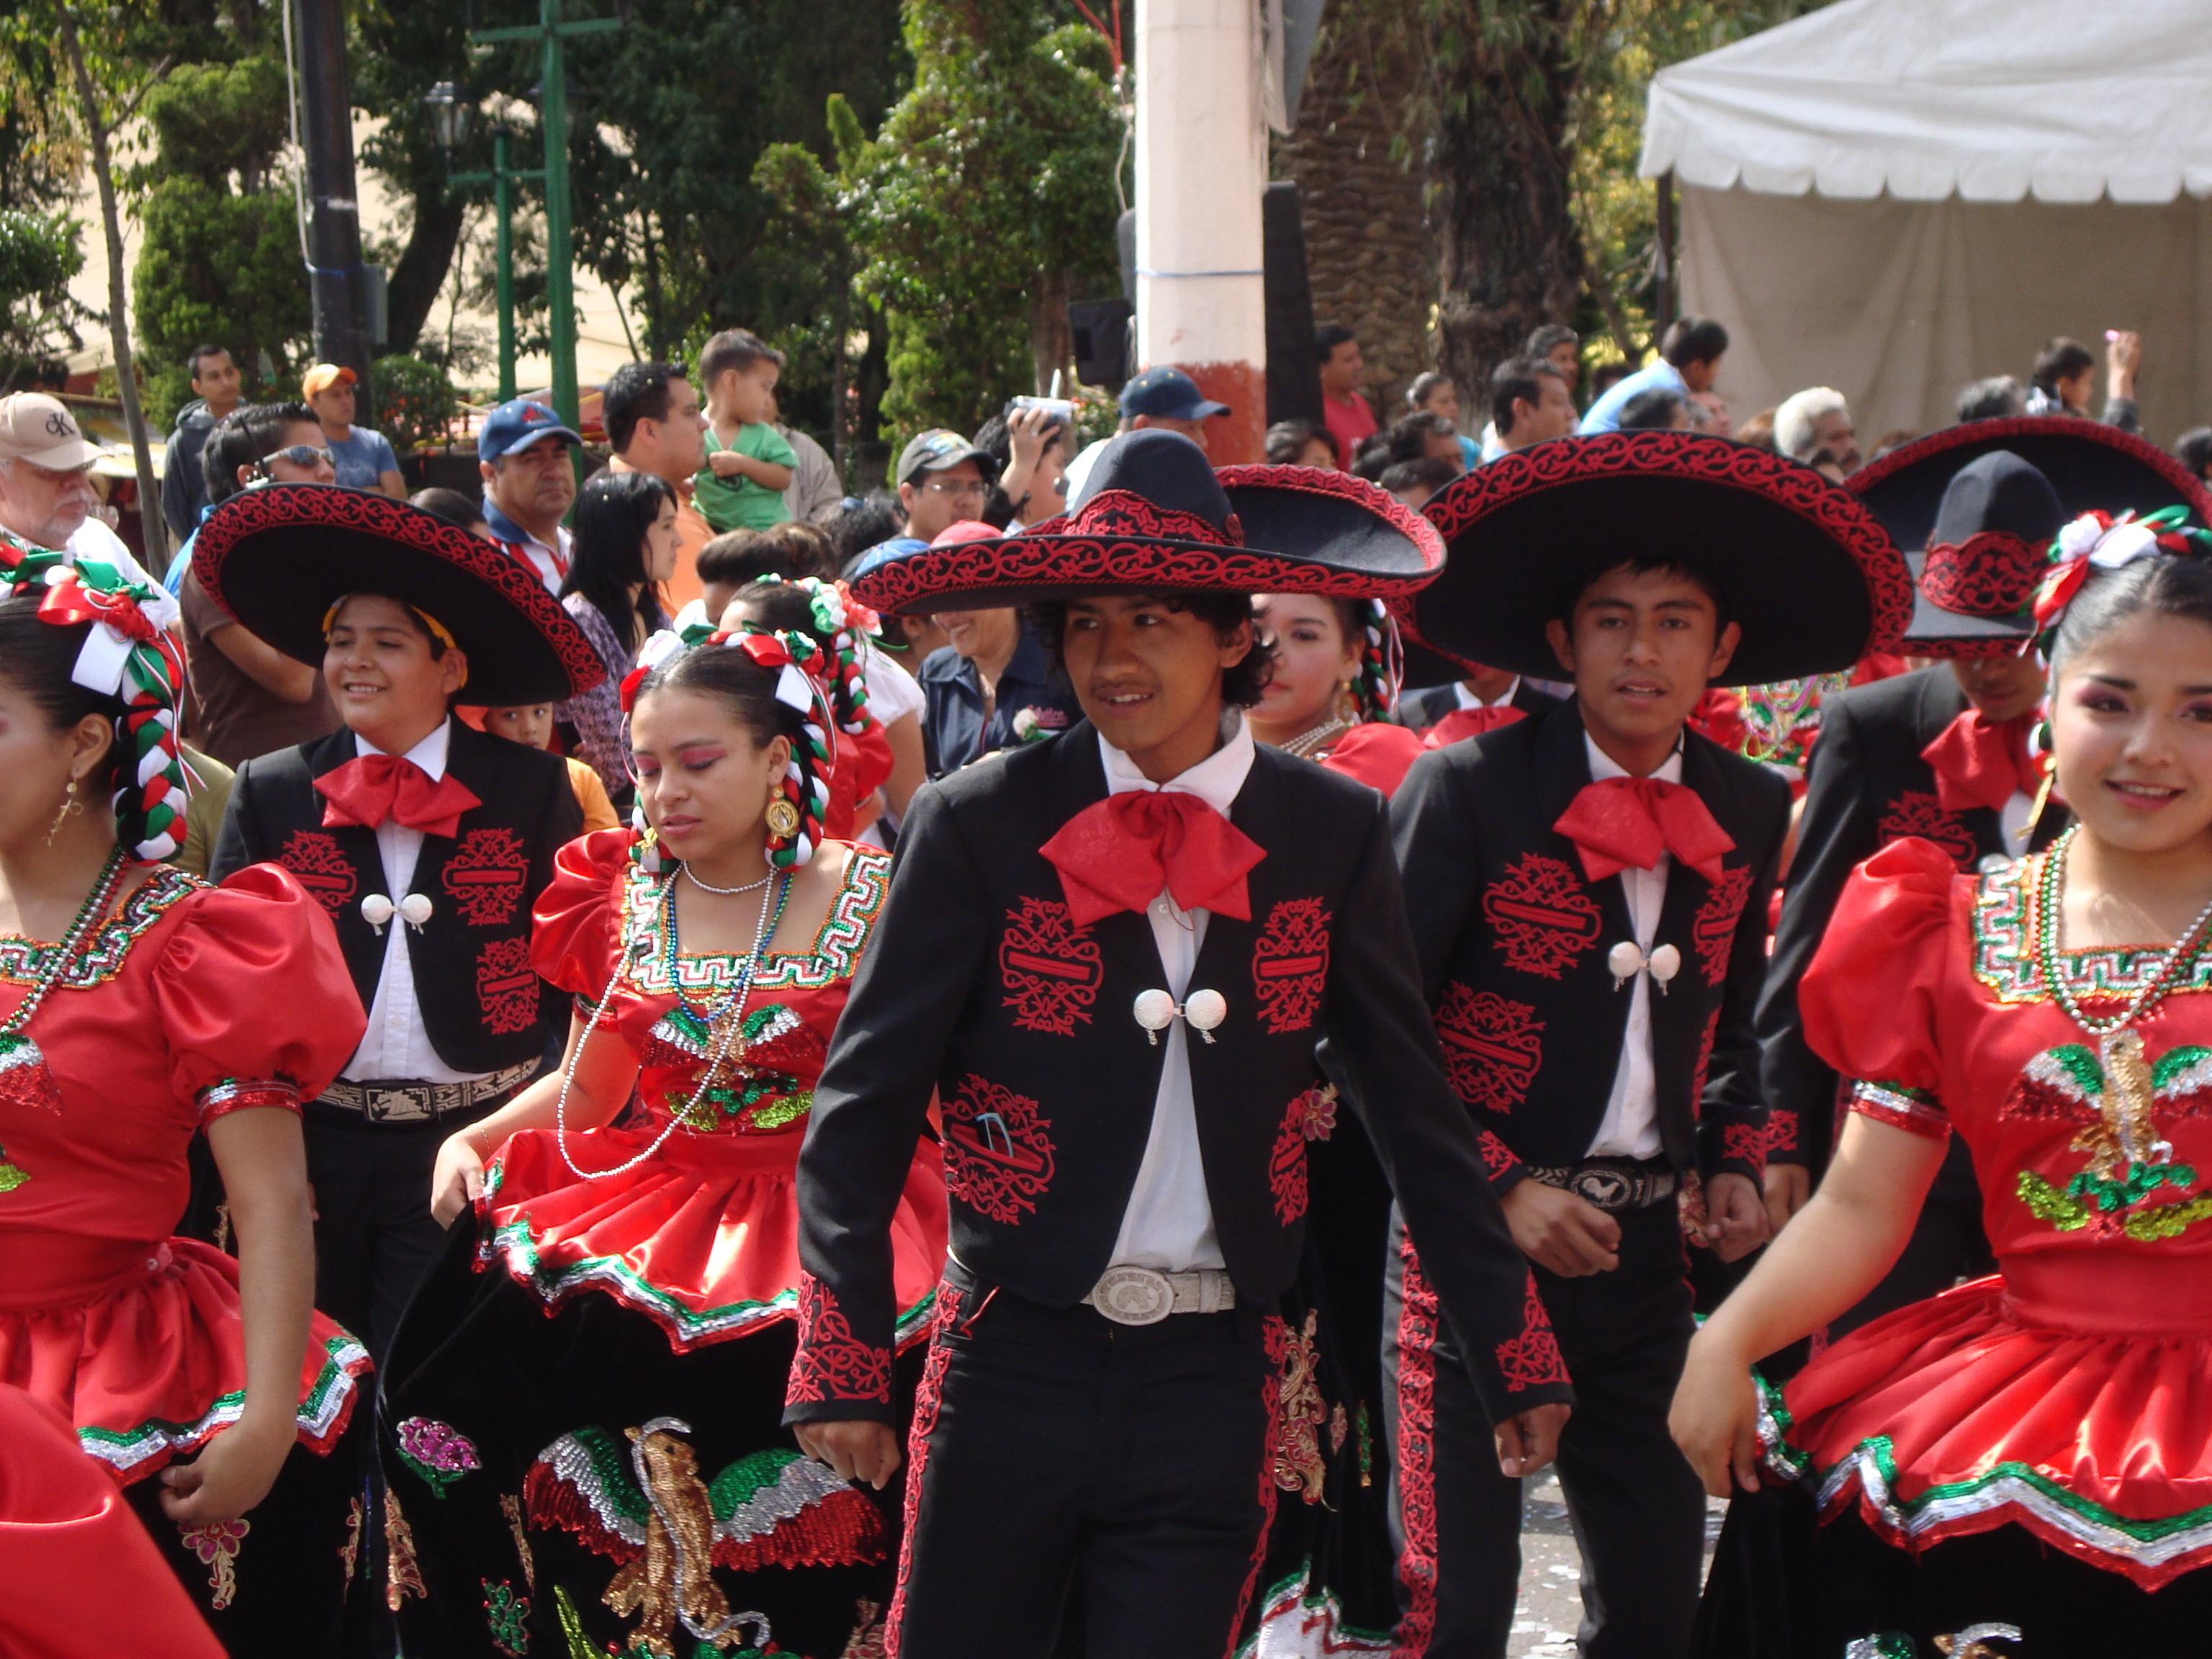 16 De Septiembre Mexico